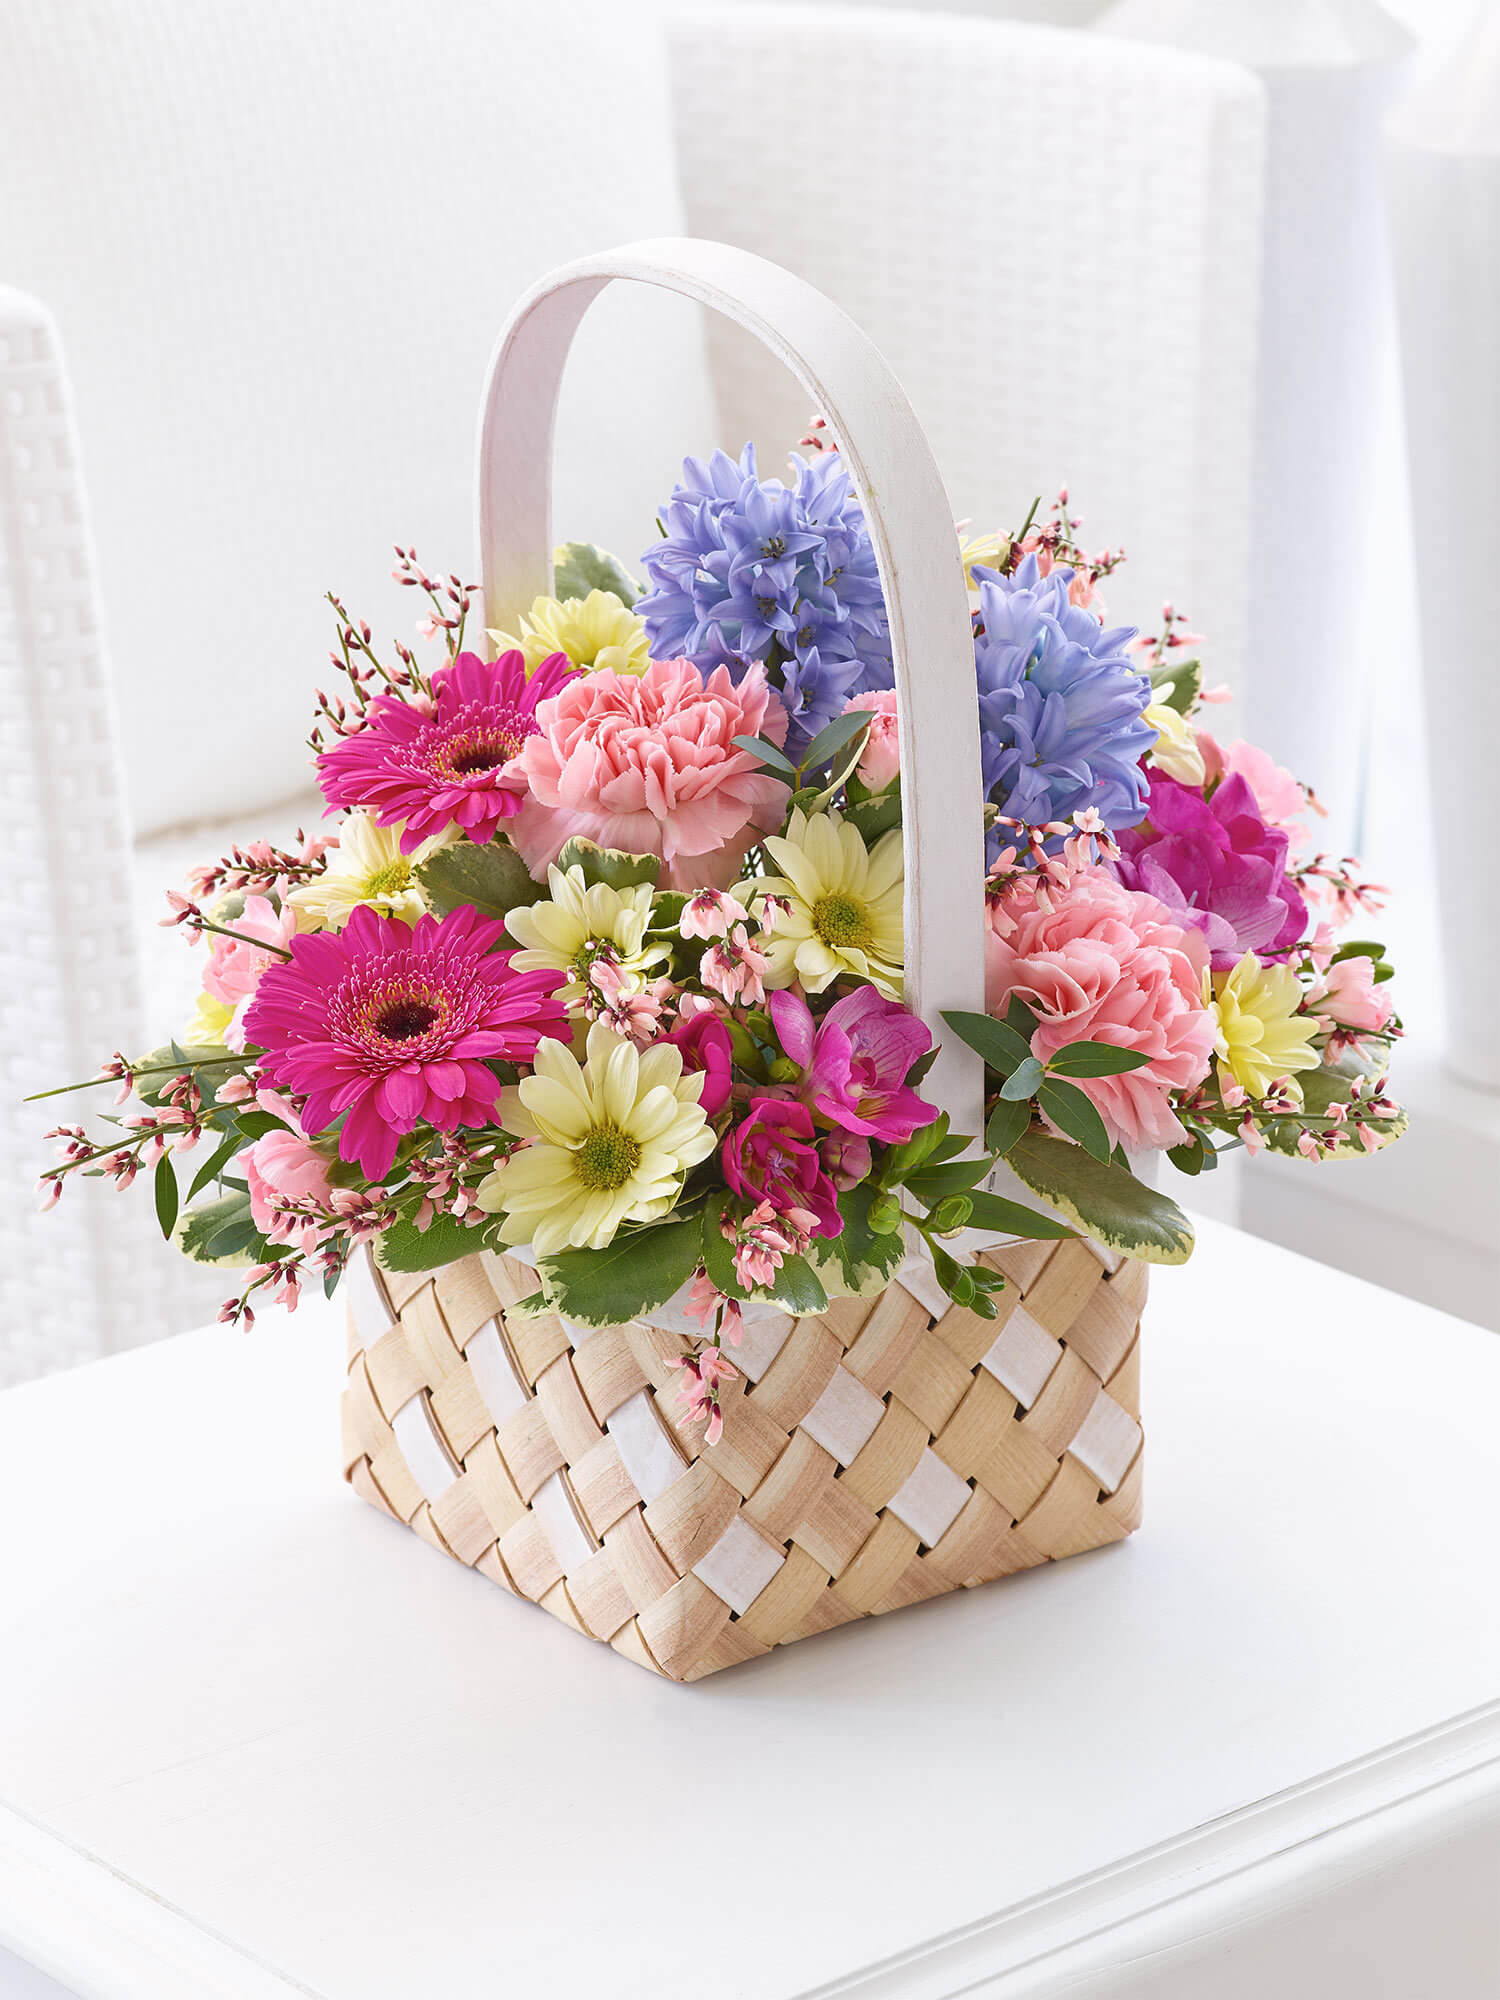 Colourful Spring Basket